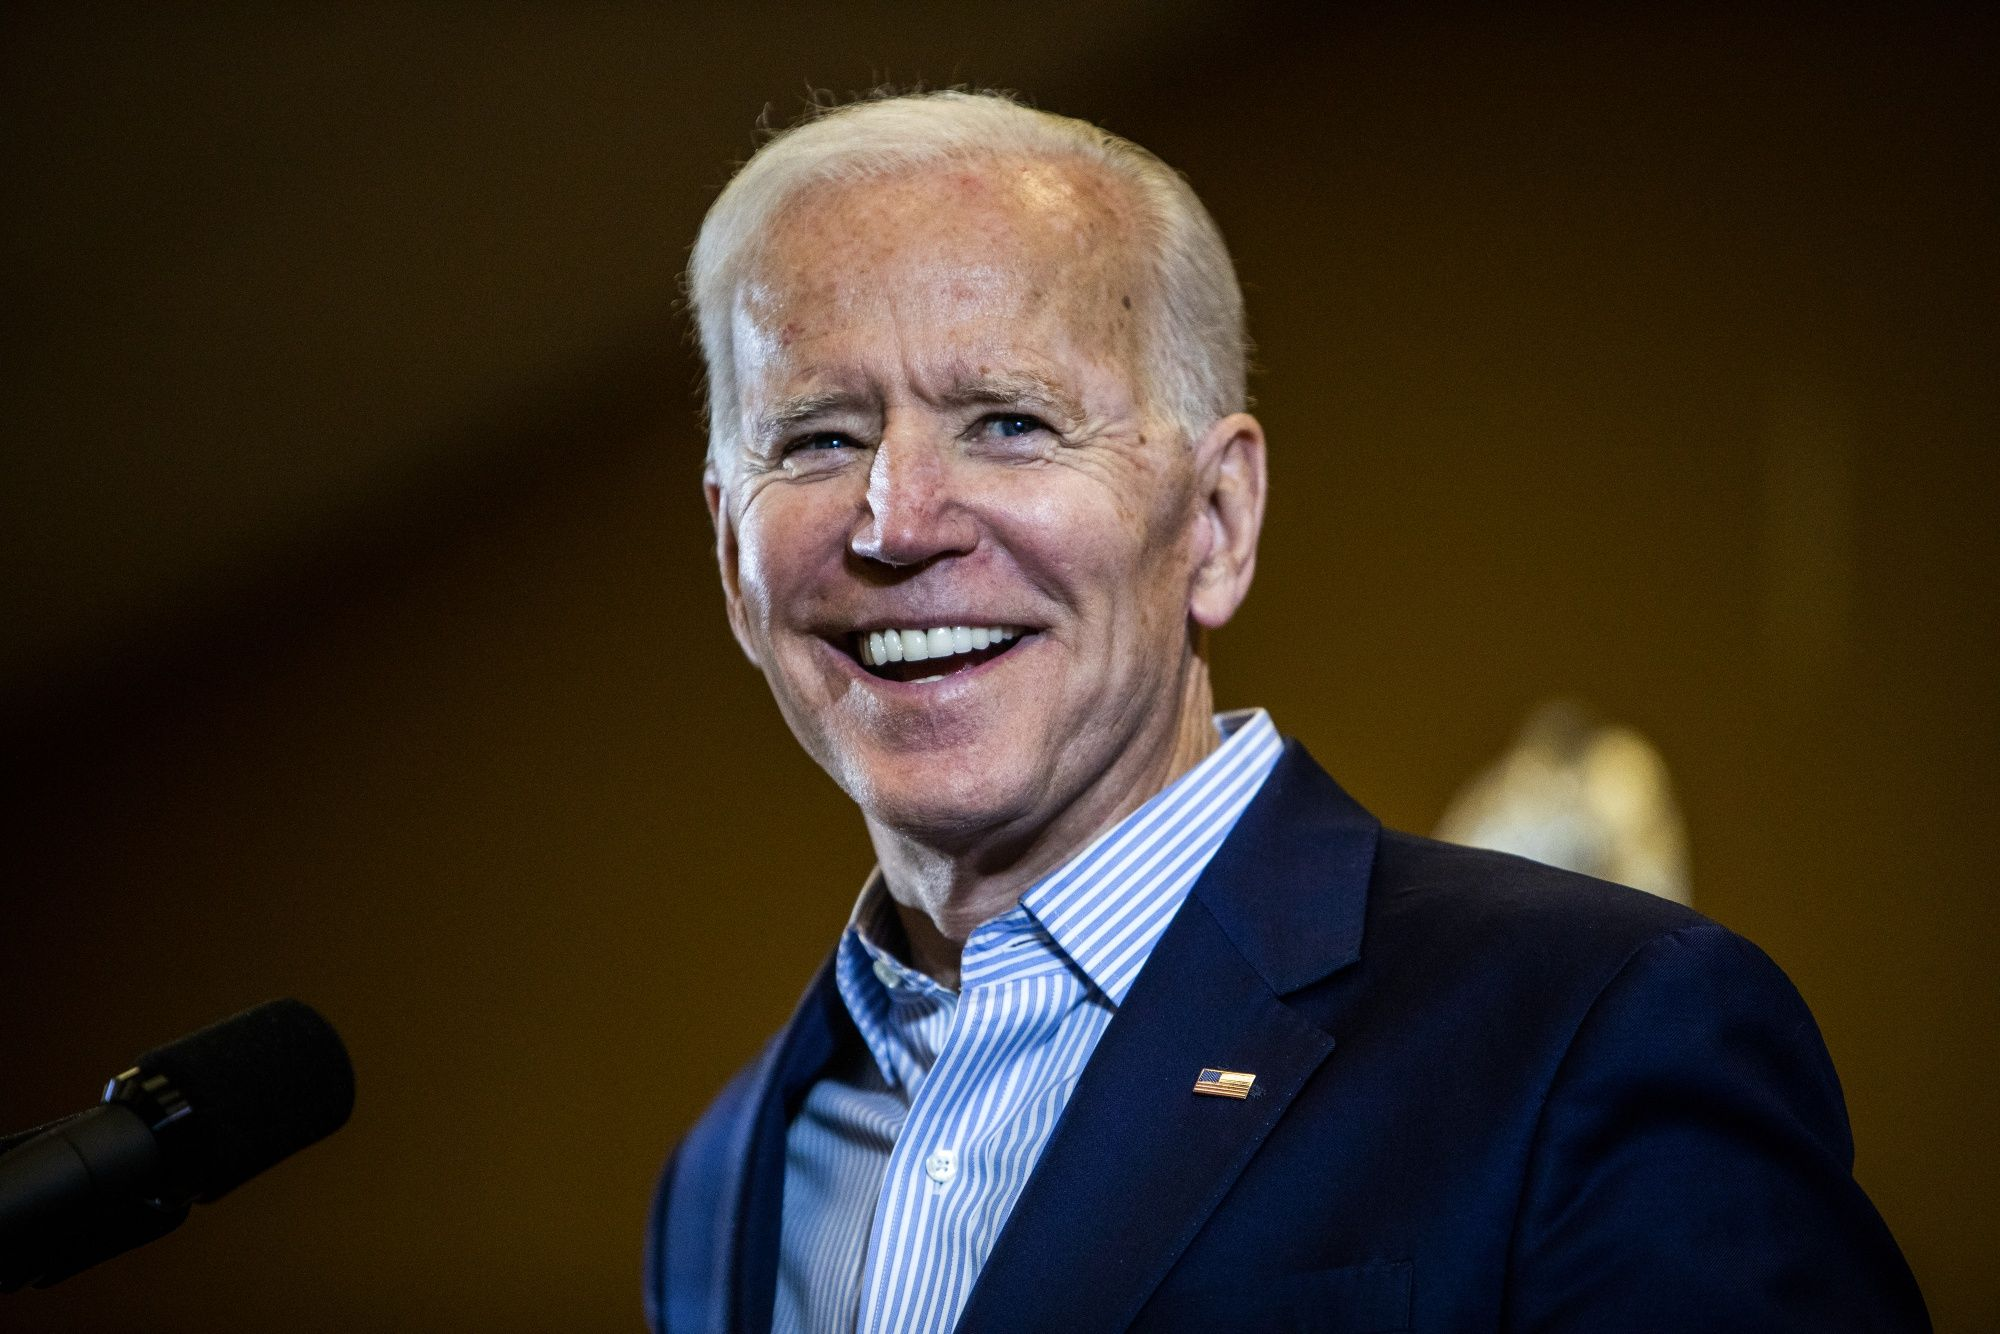 Biden Leads Democratic Field in Poll of Iowa Caucus Goers